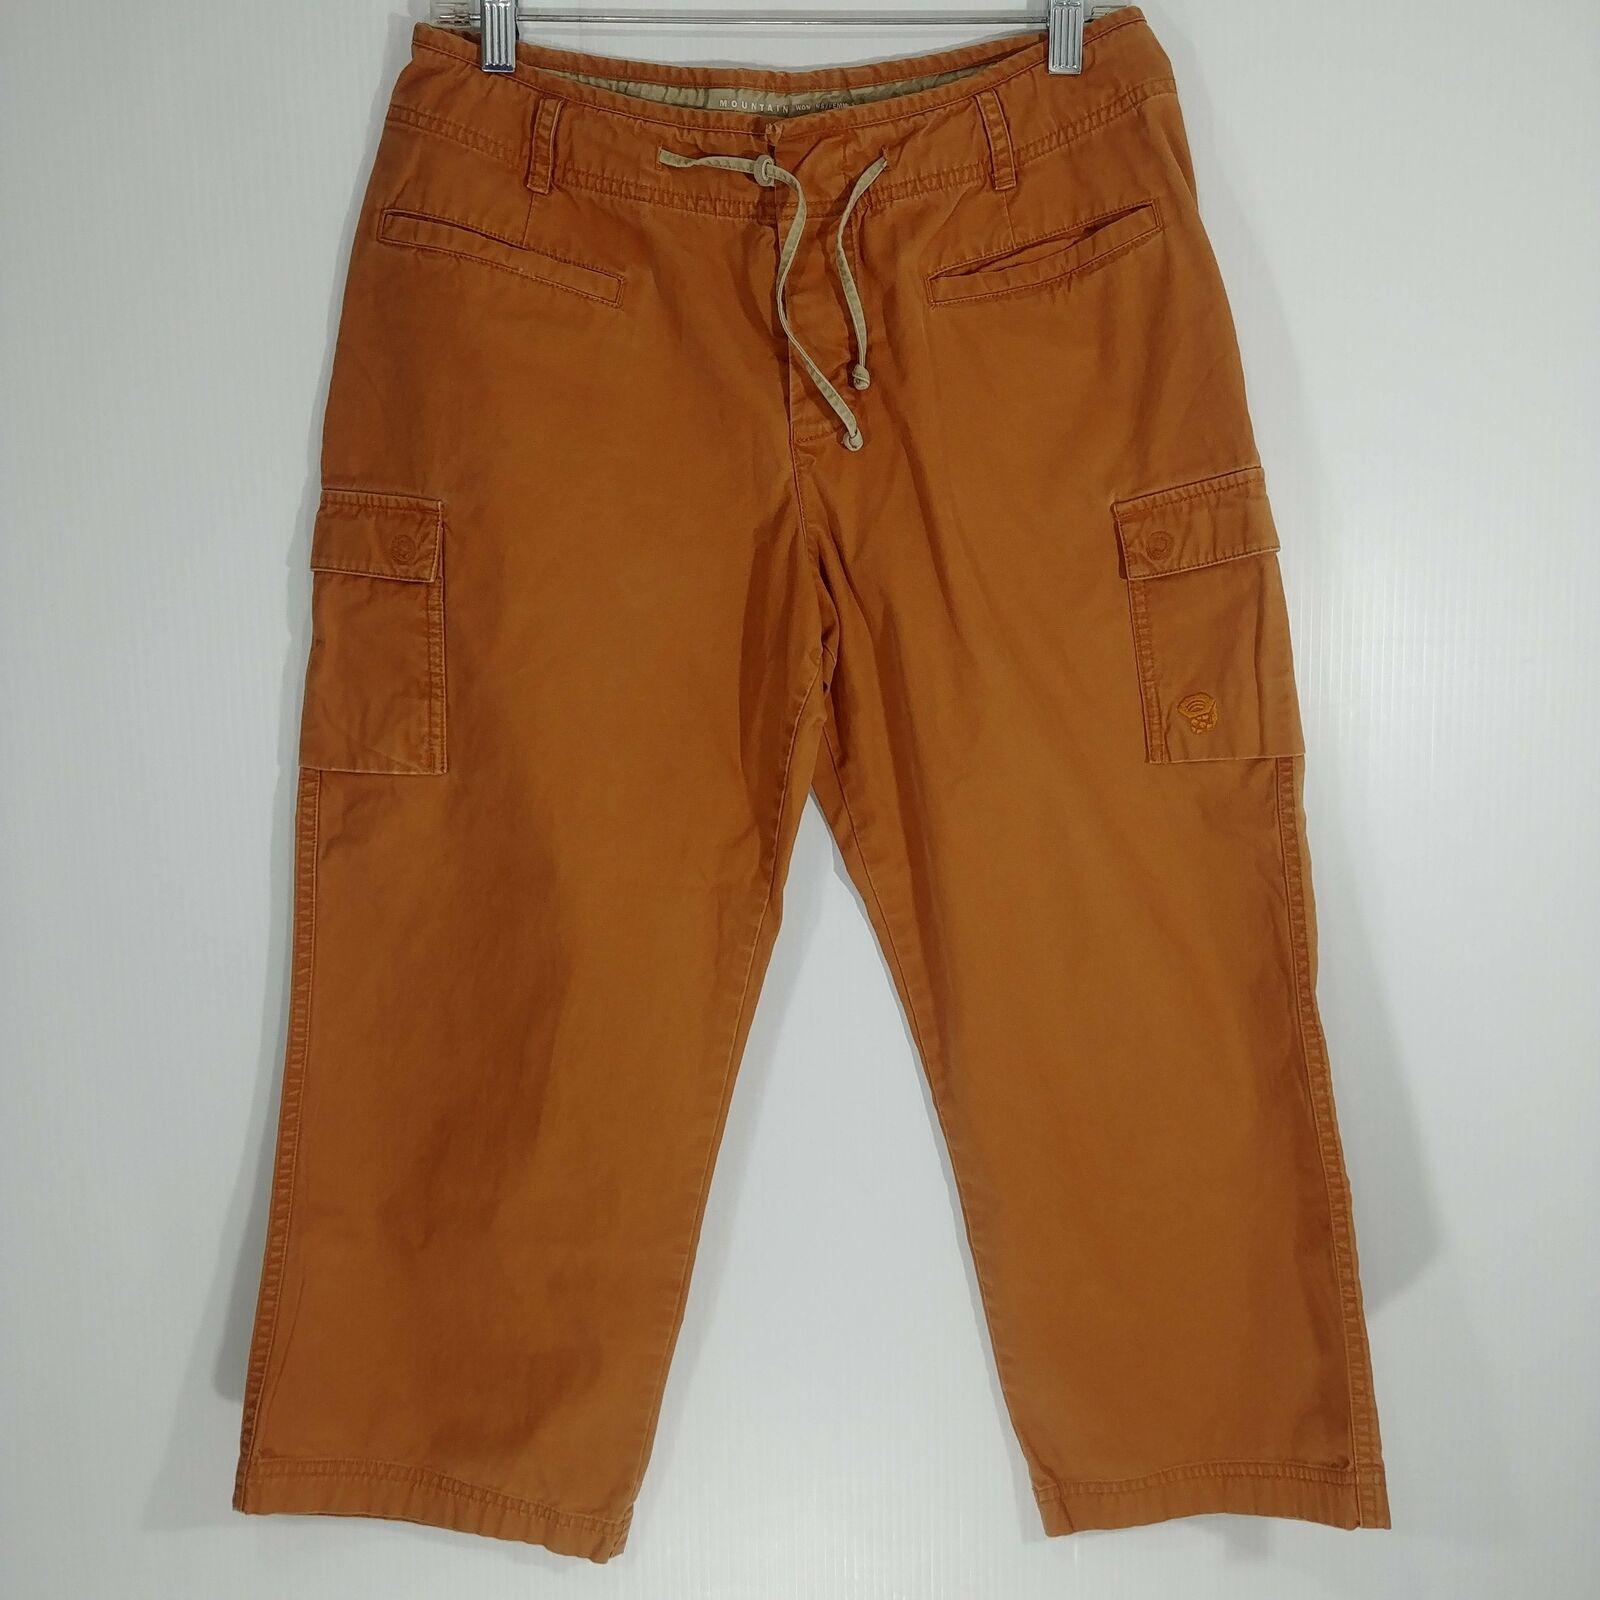 Mountain Hardwear Cropped Hiking Pants - Women's 8 - Pre-owned (G44KT8-B10)